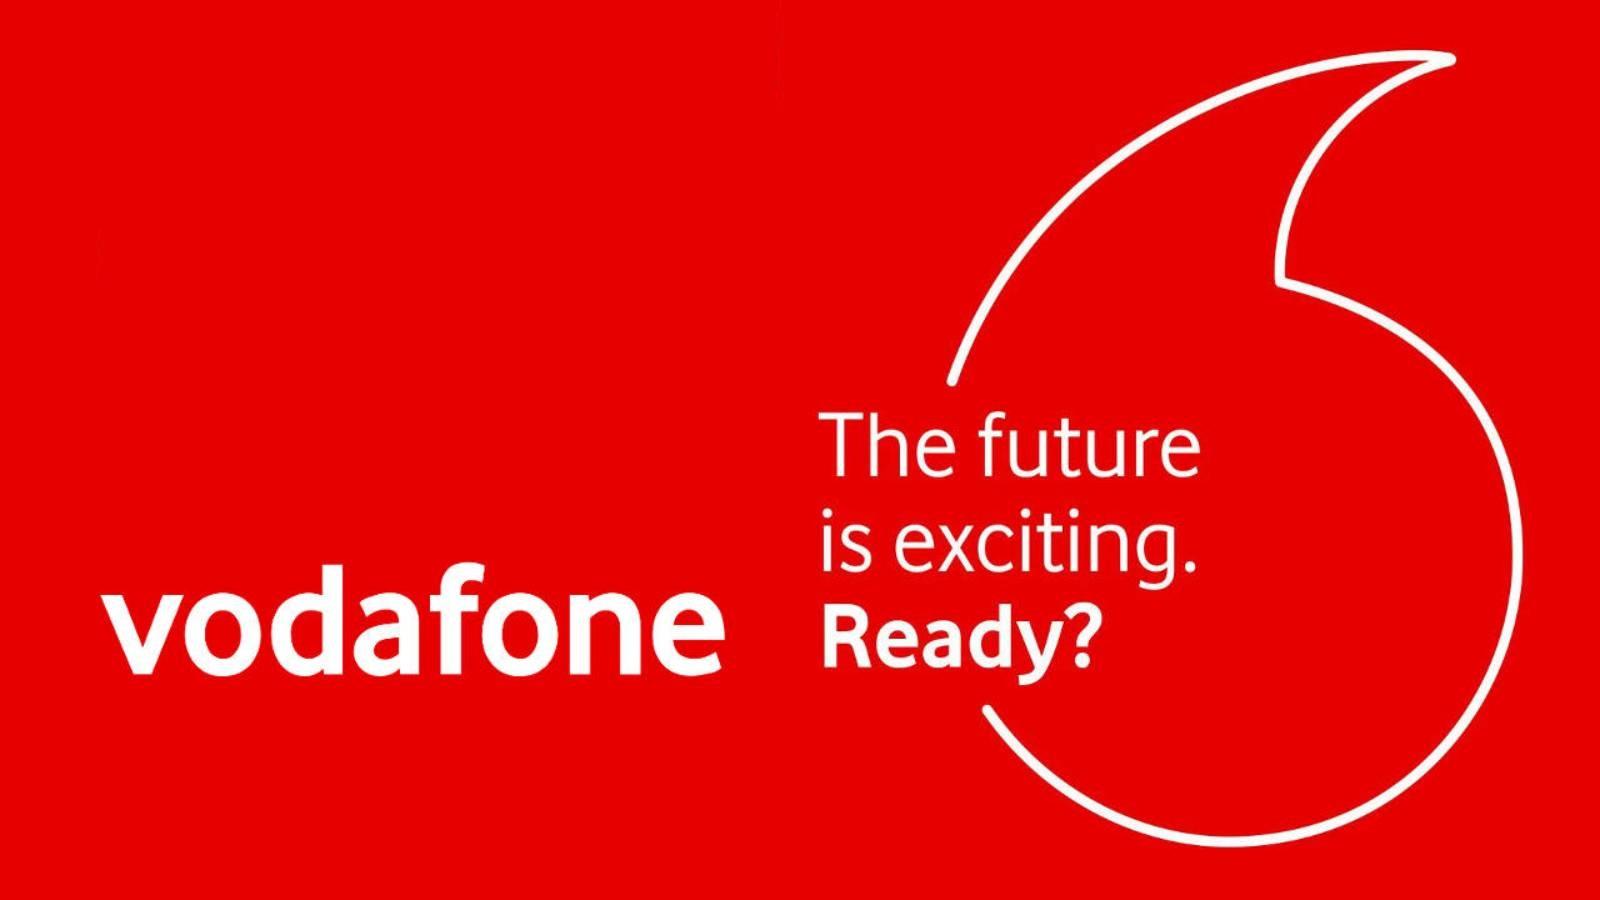 Vodafone avans